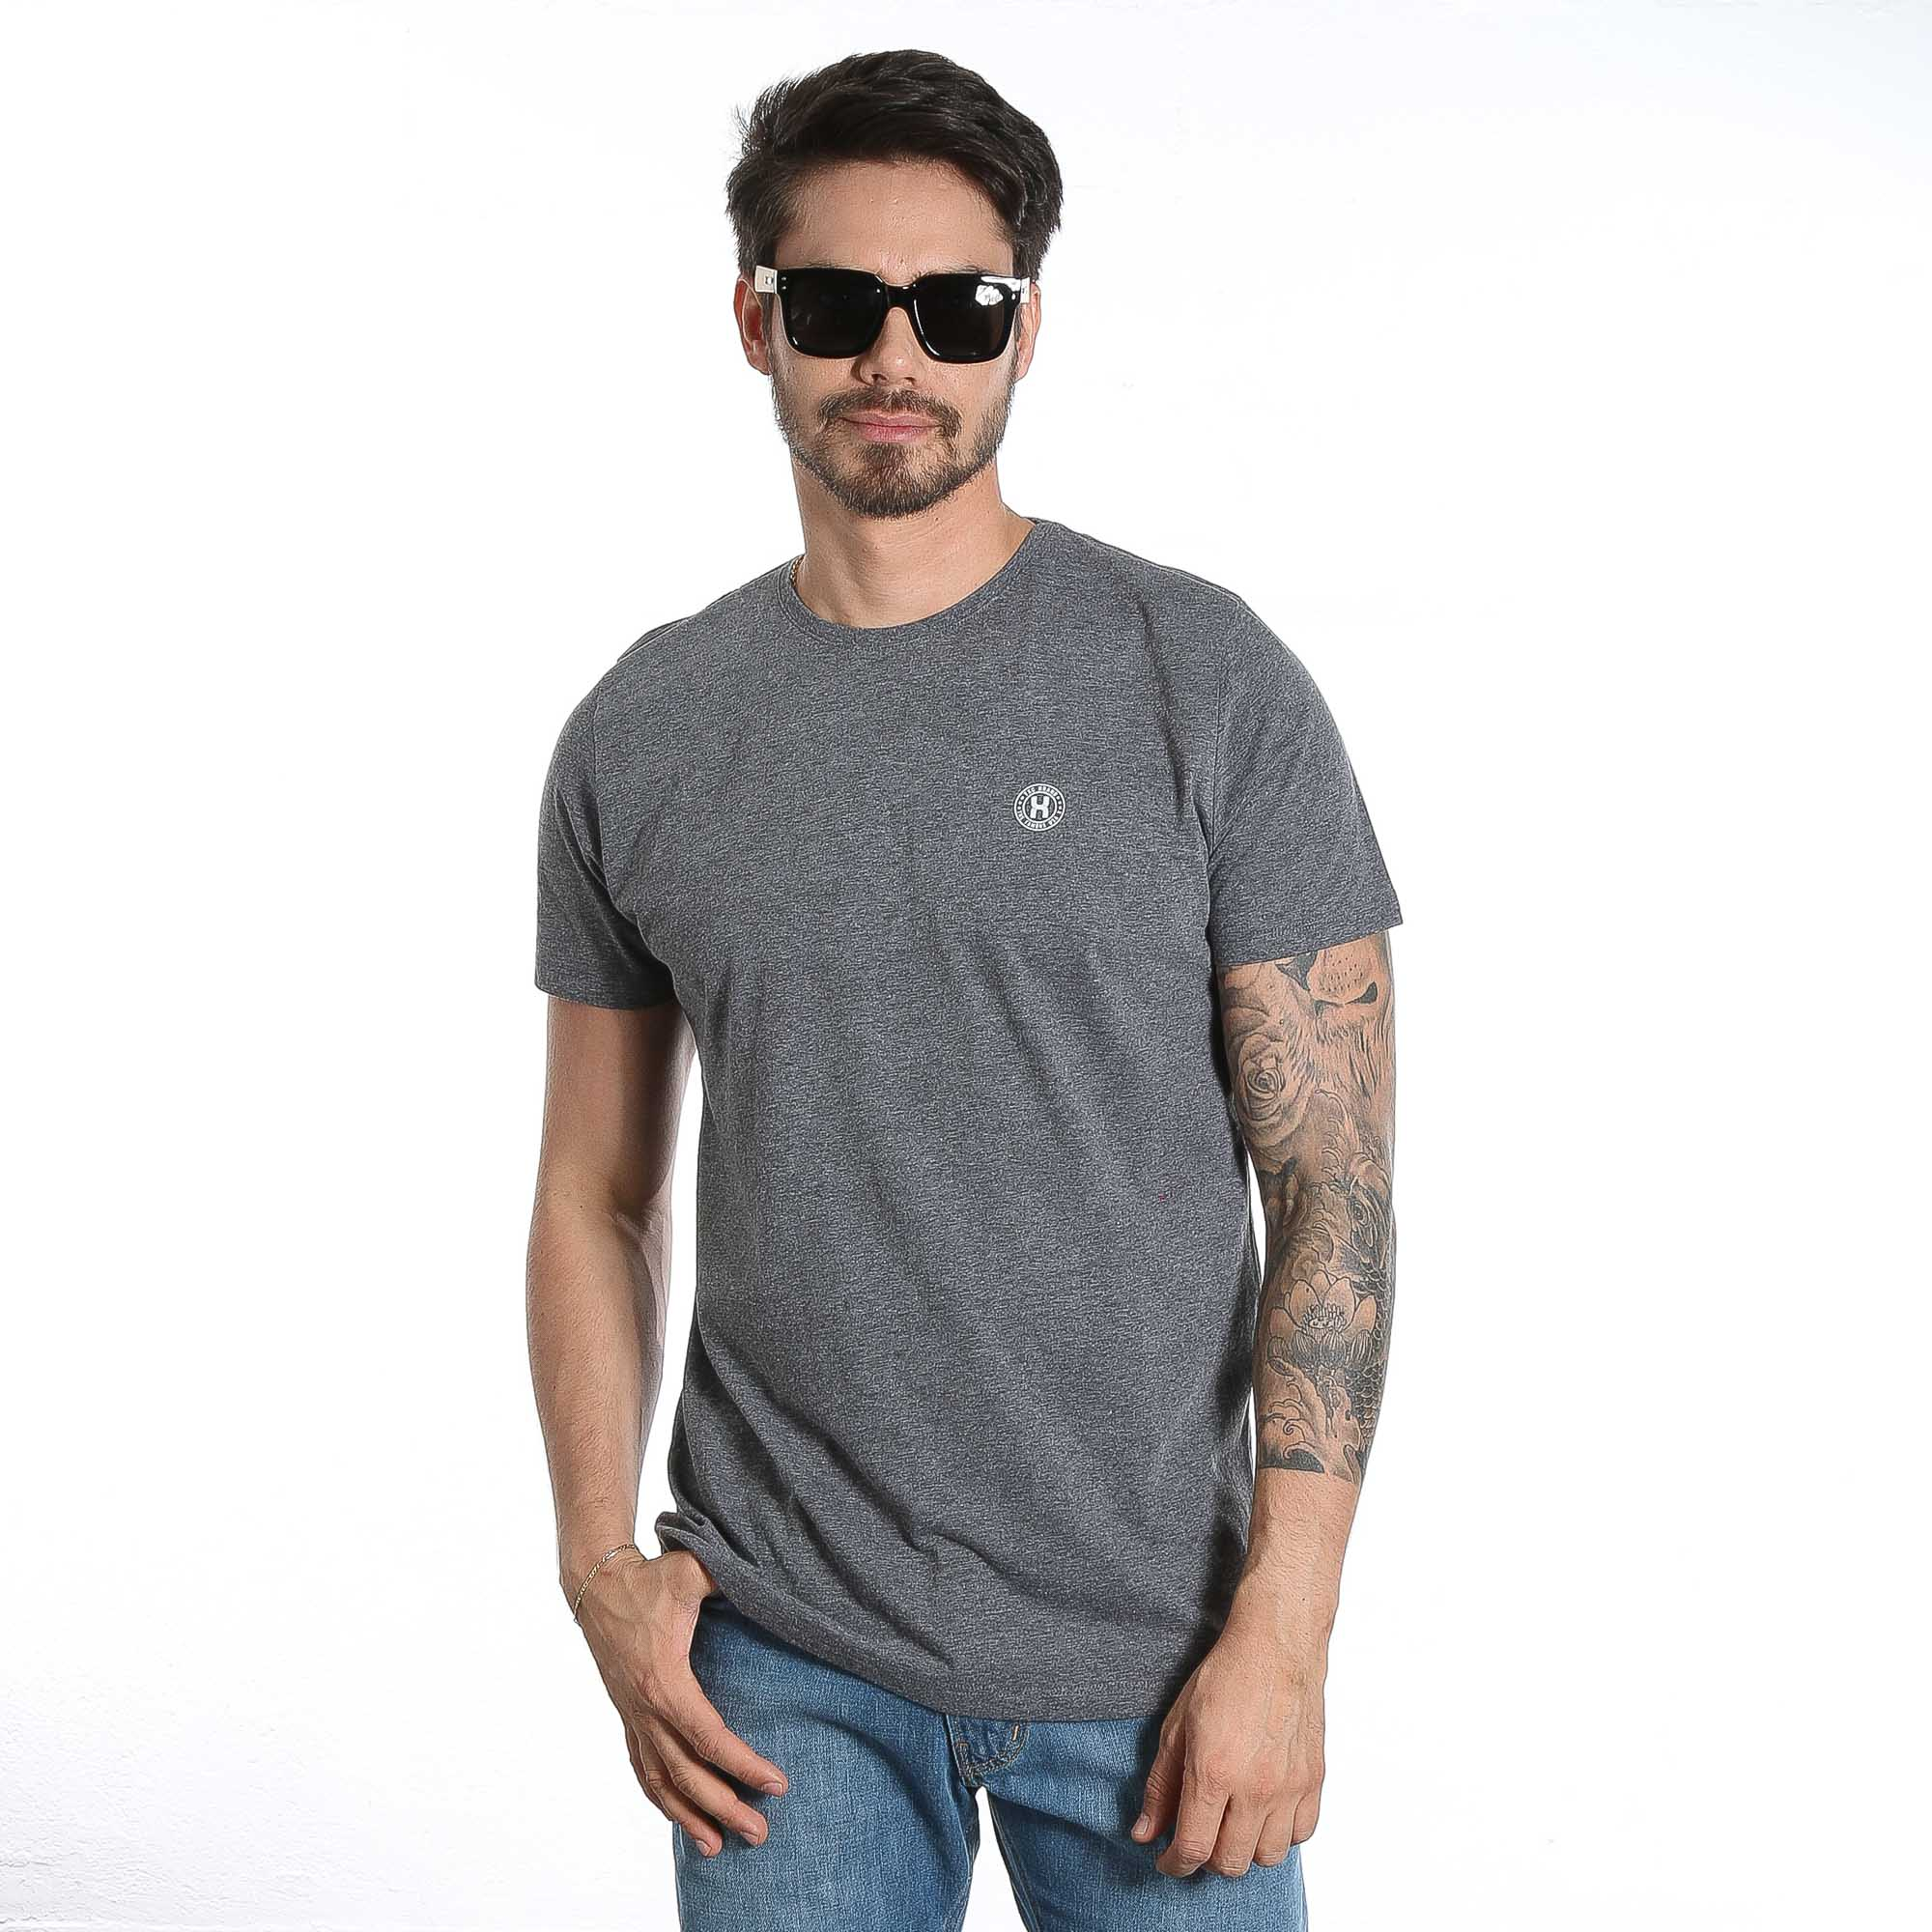 Camiseta Masculina TXC 1547